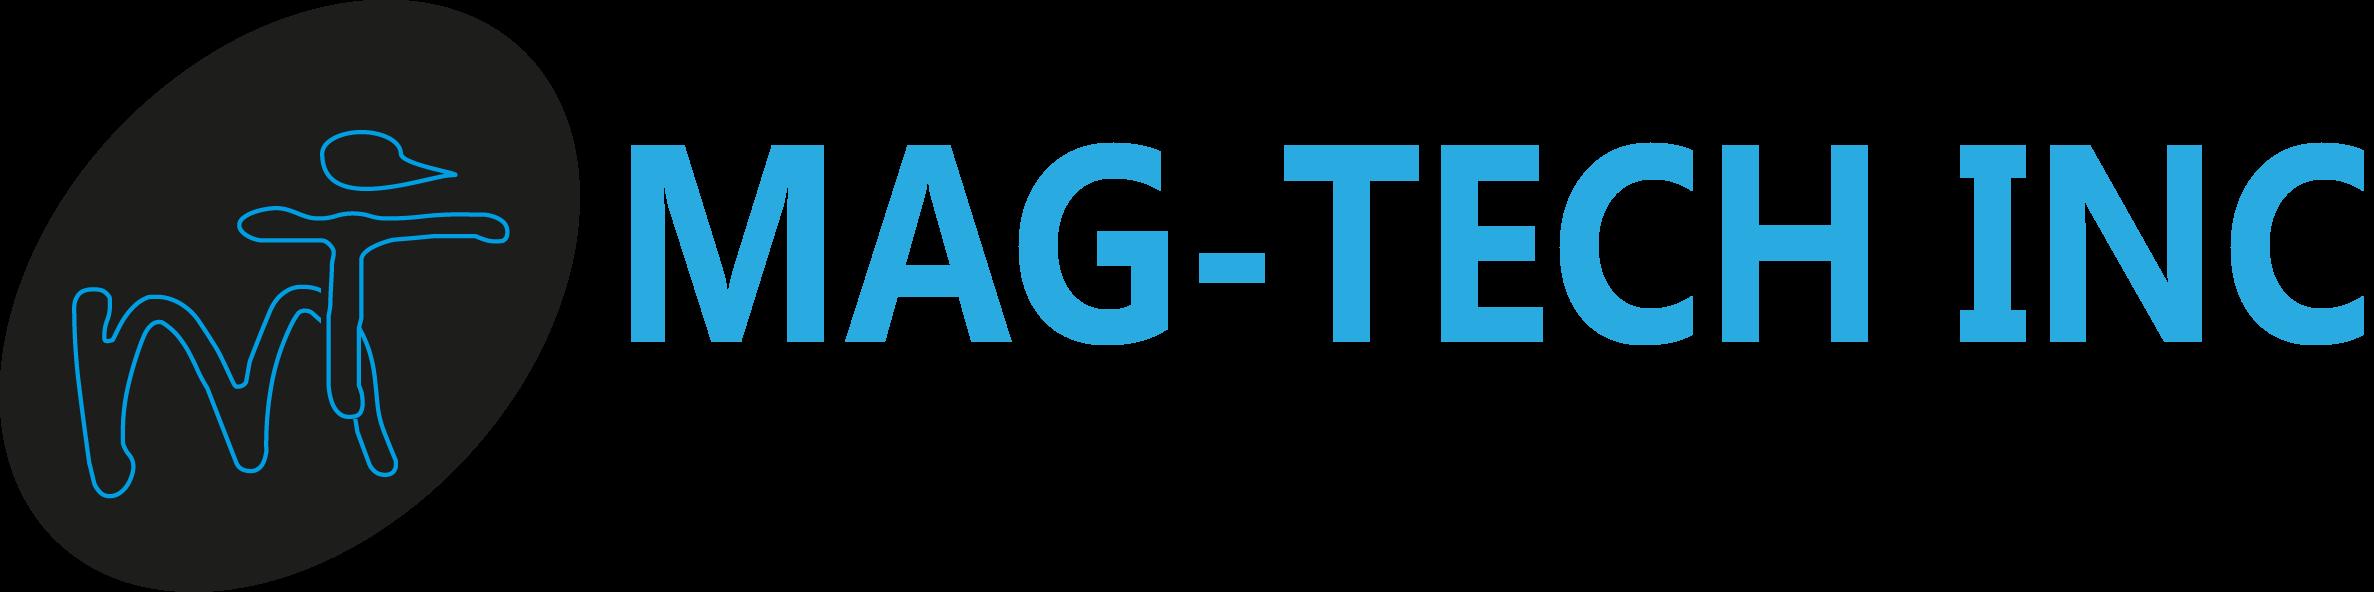 MAG-TECH INC